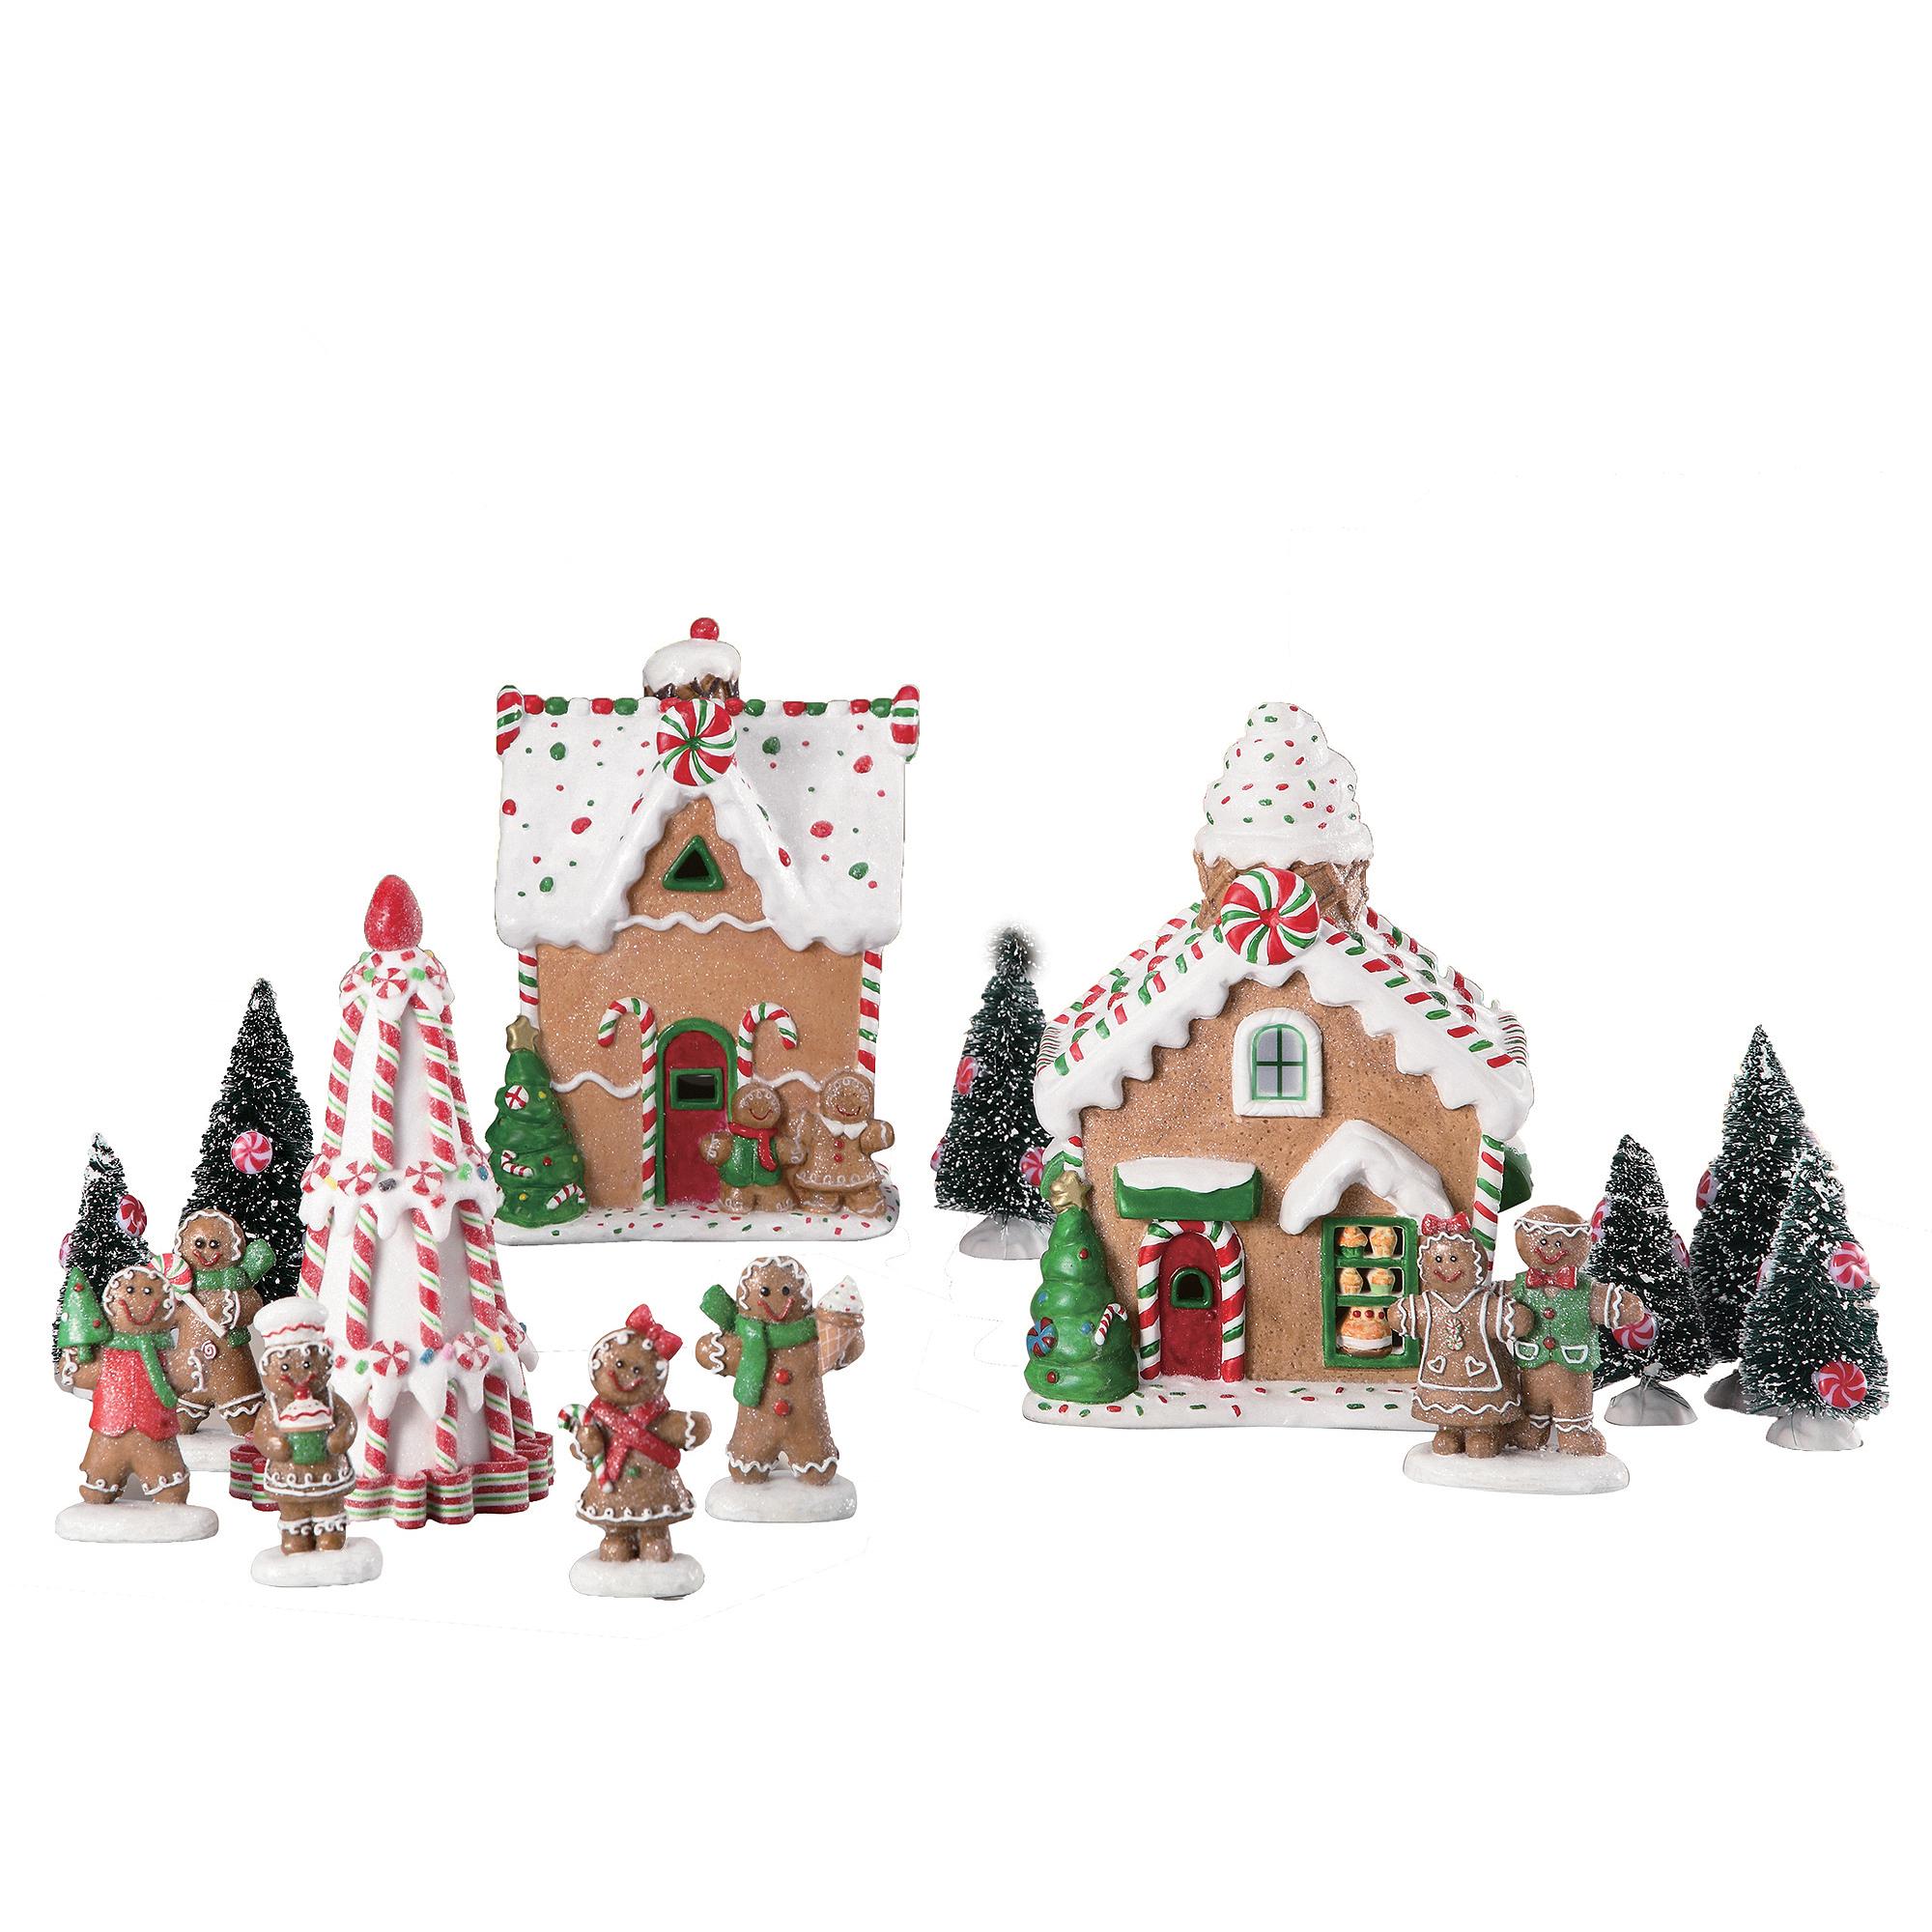 Buying Christmas Trees